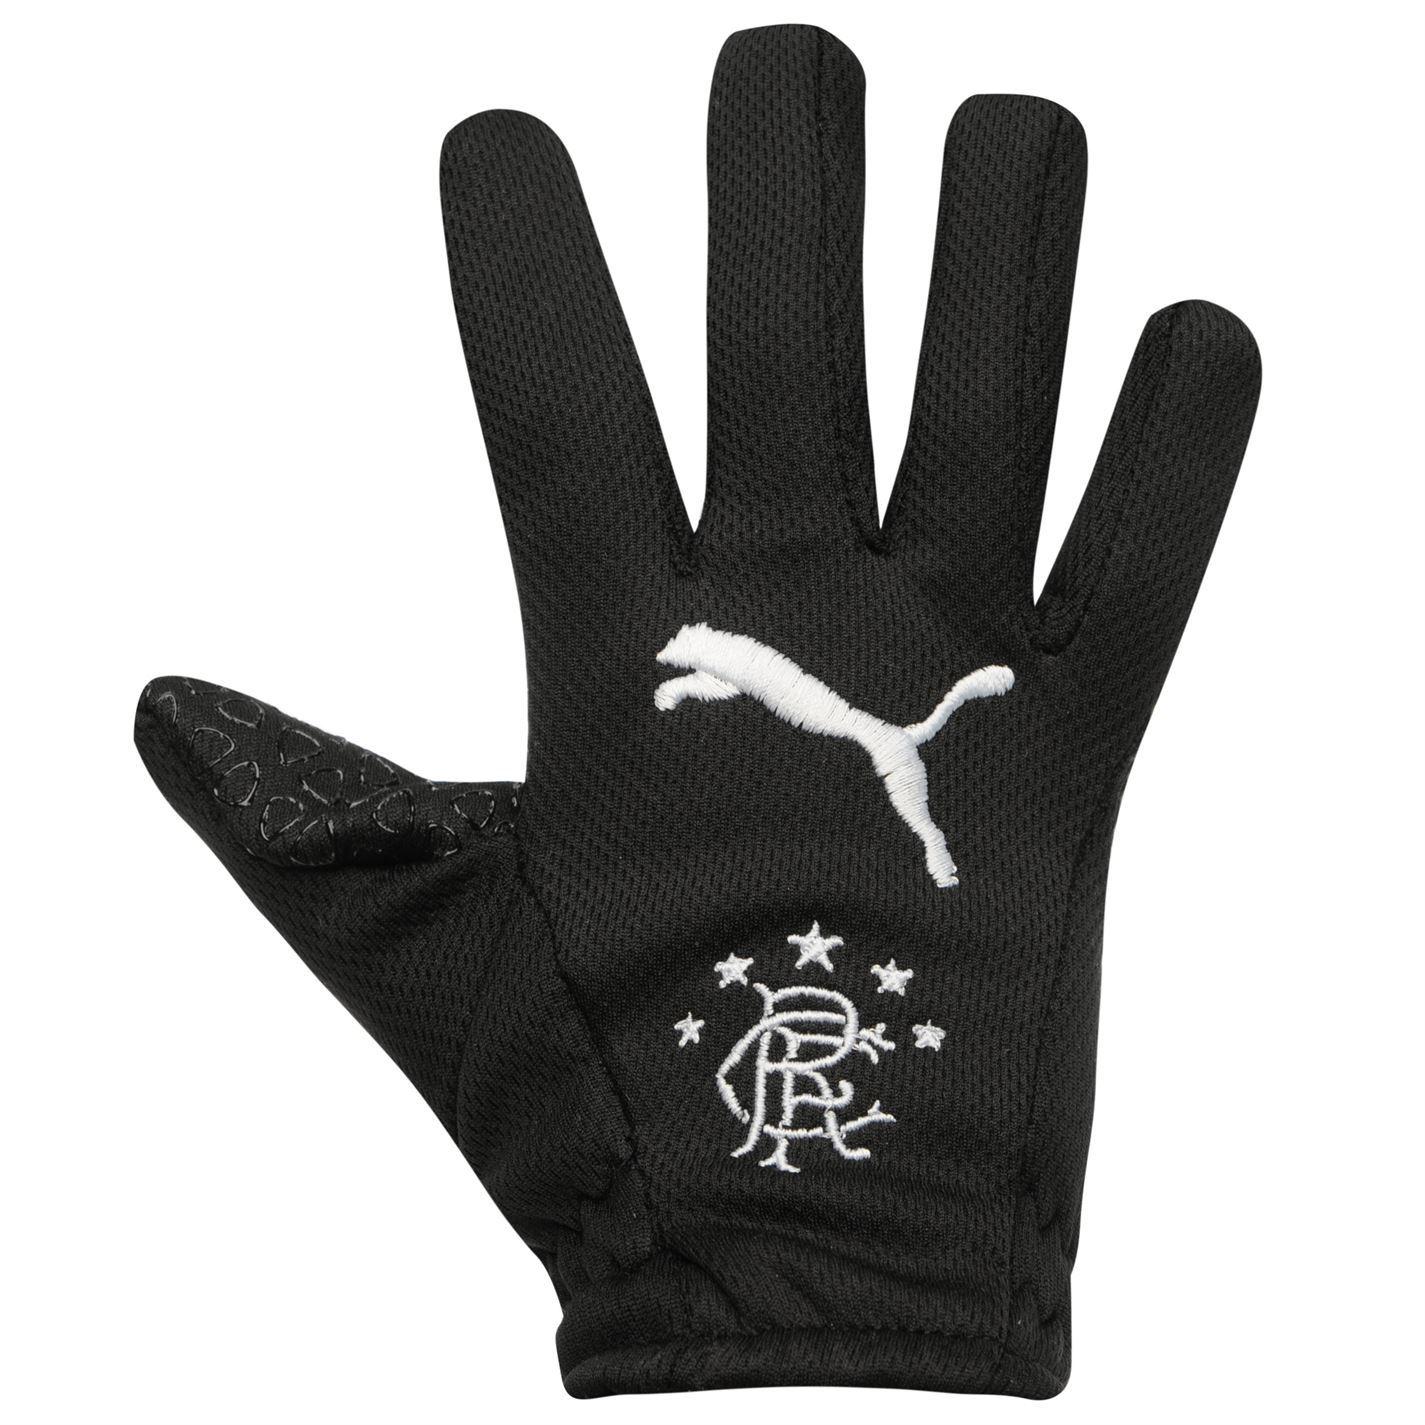 0 Glasgow Rangers Gloves